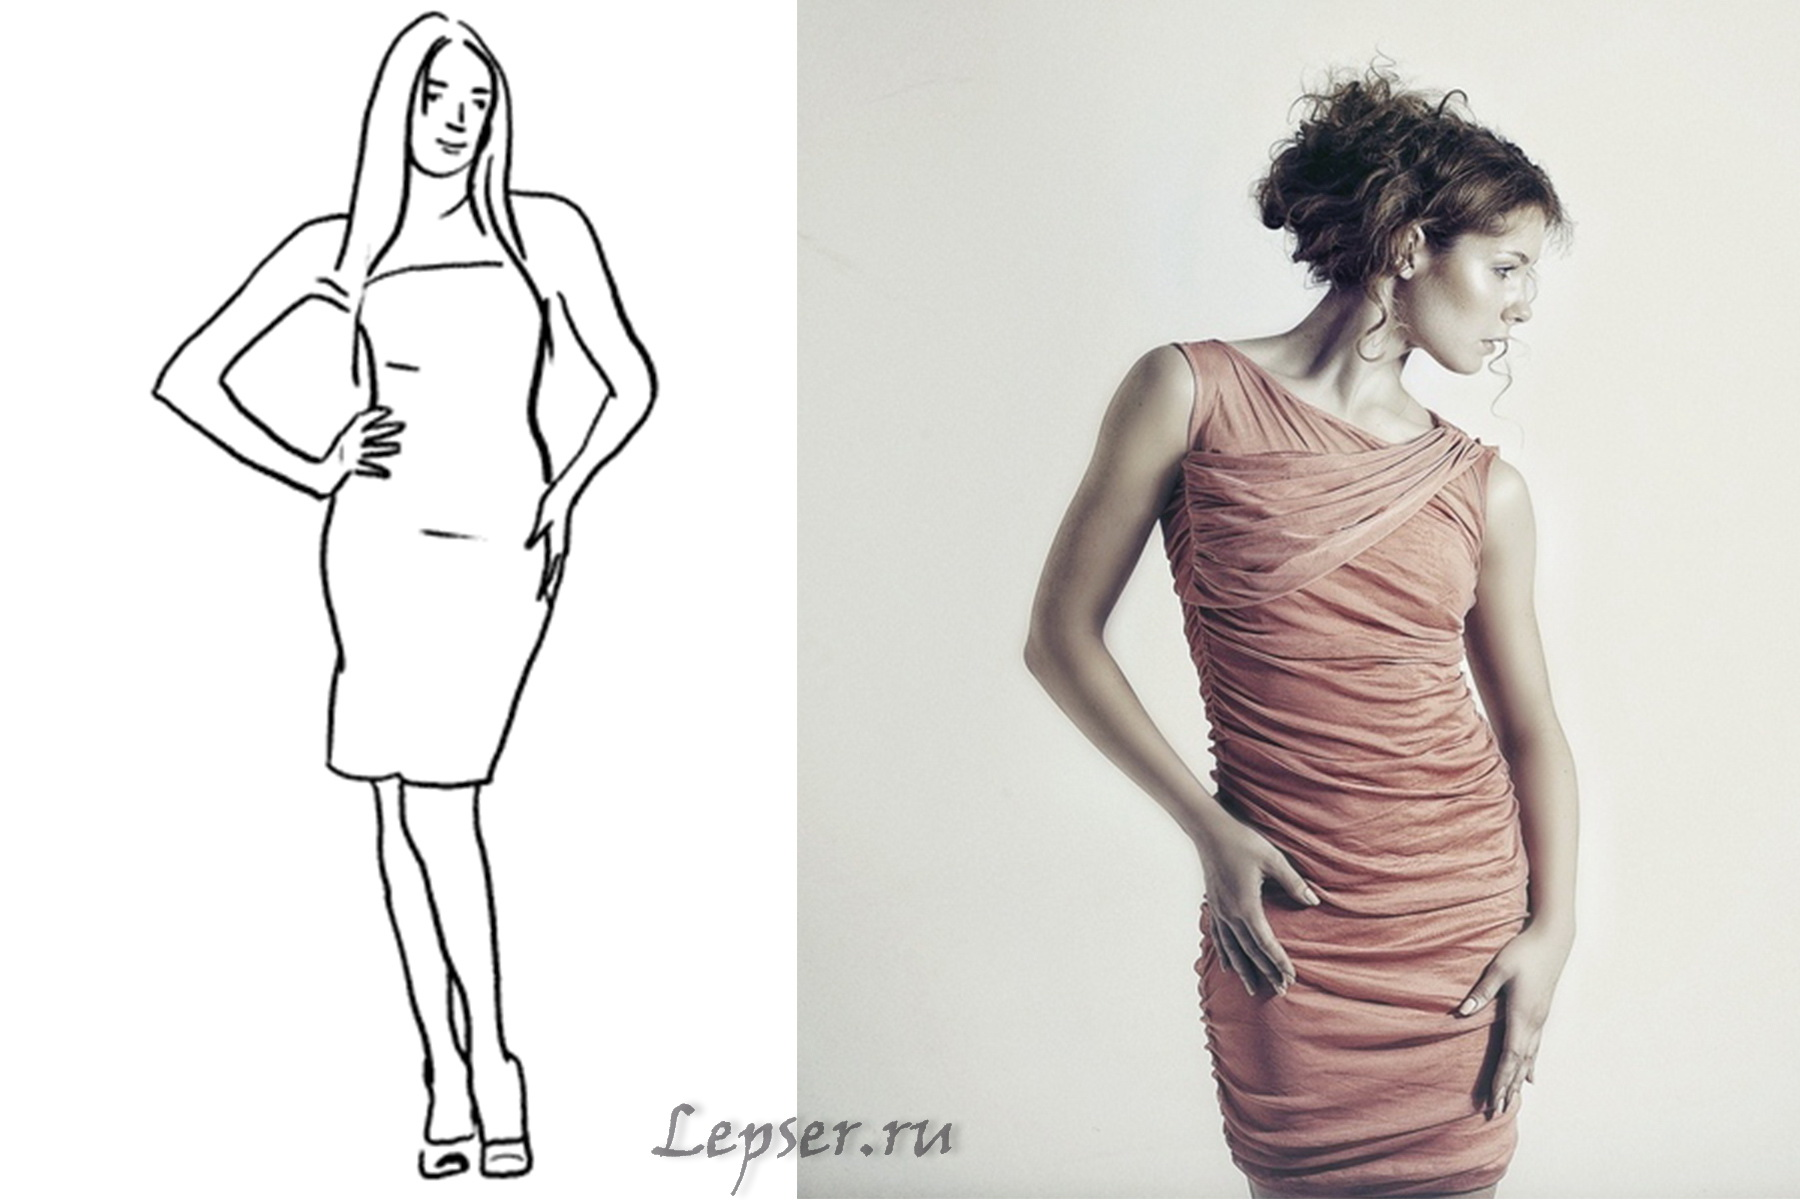 Женщина в разных ракурсах — pic 11